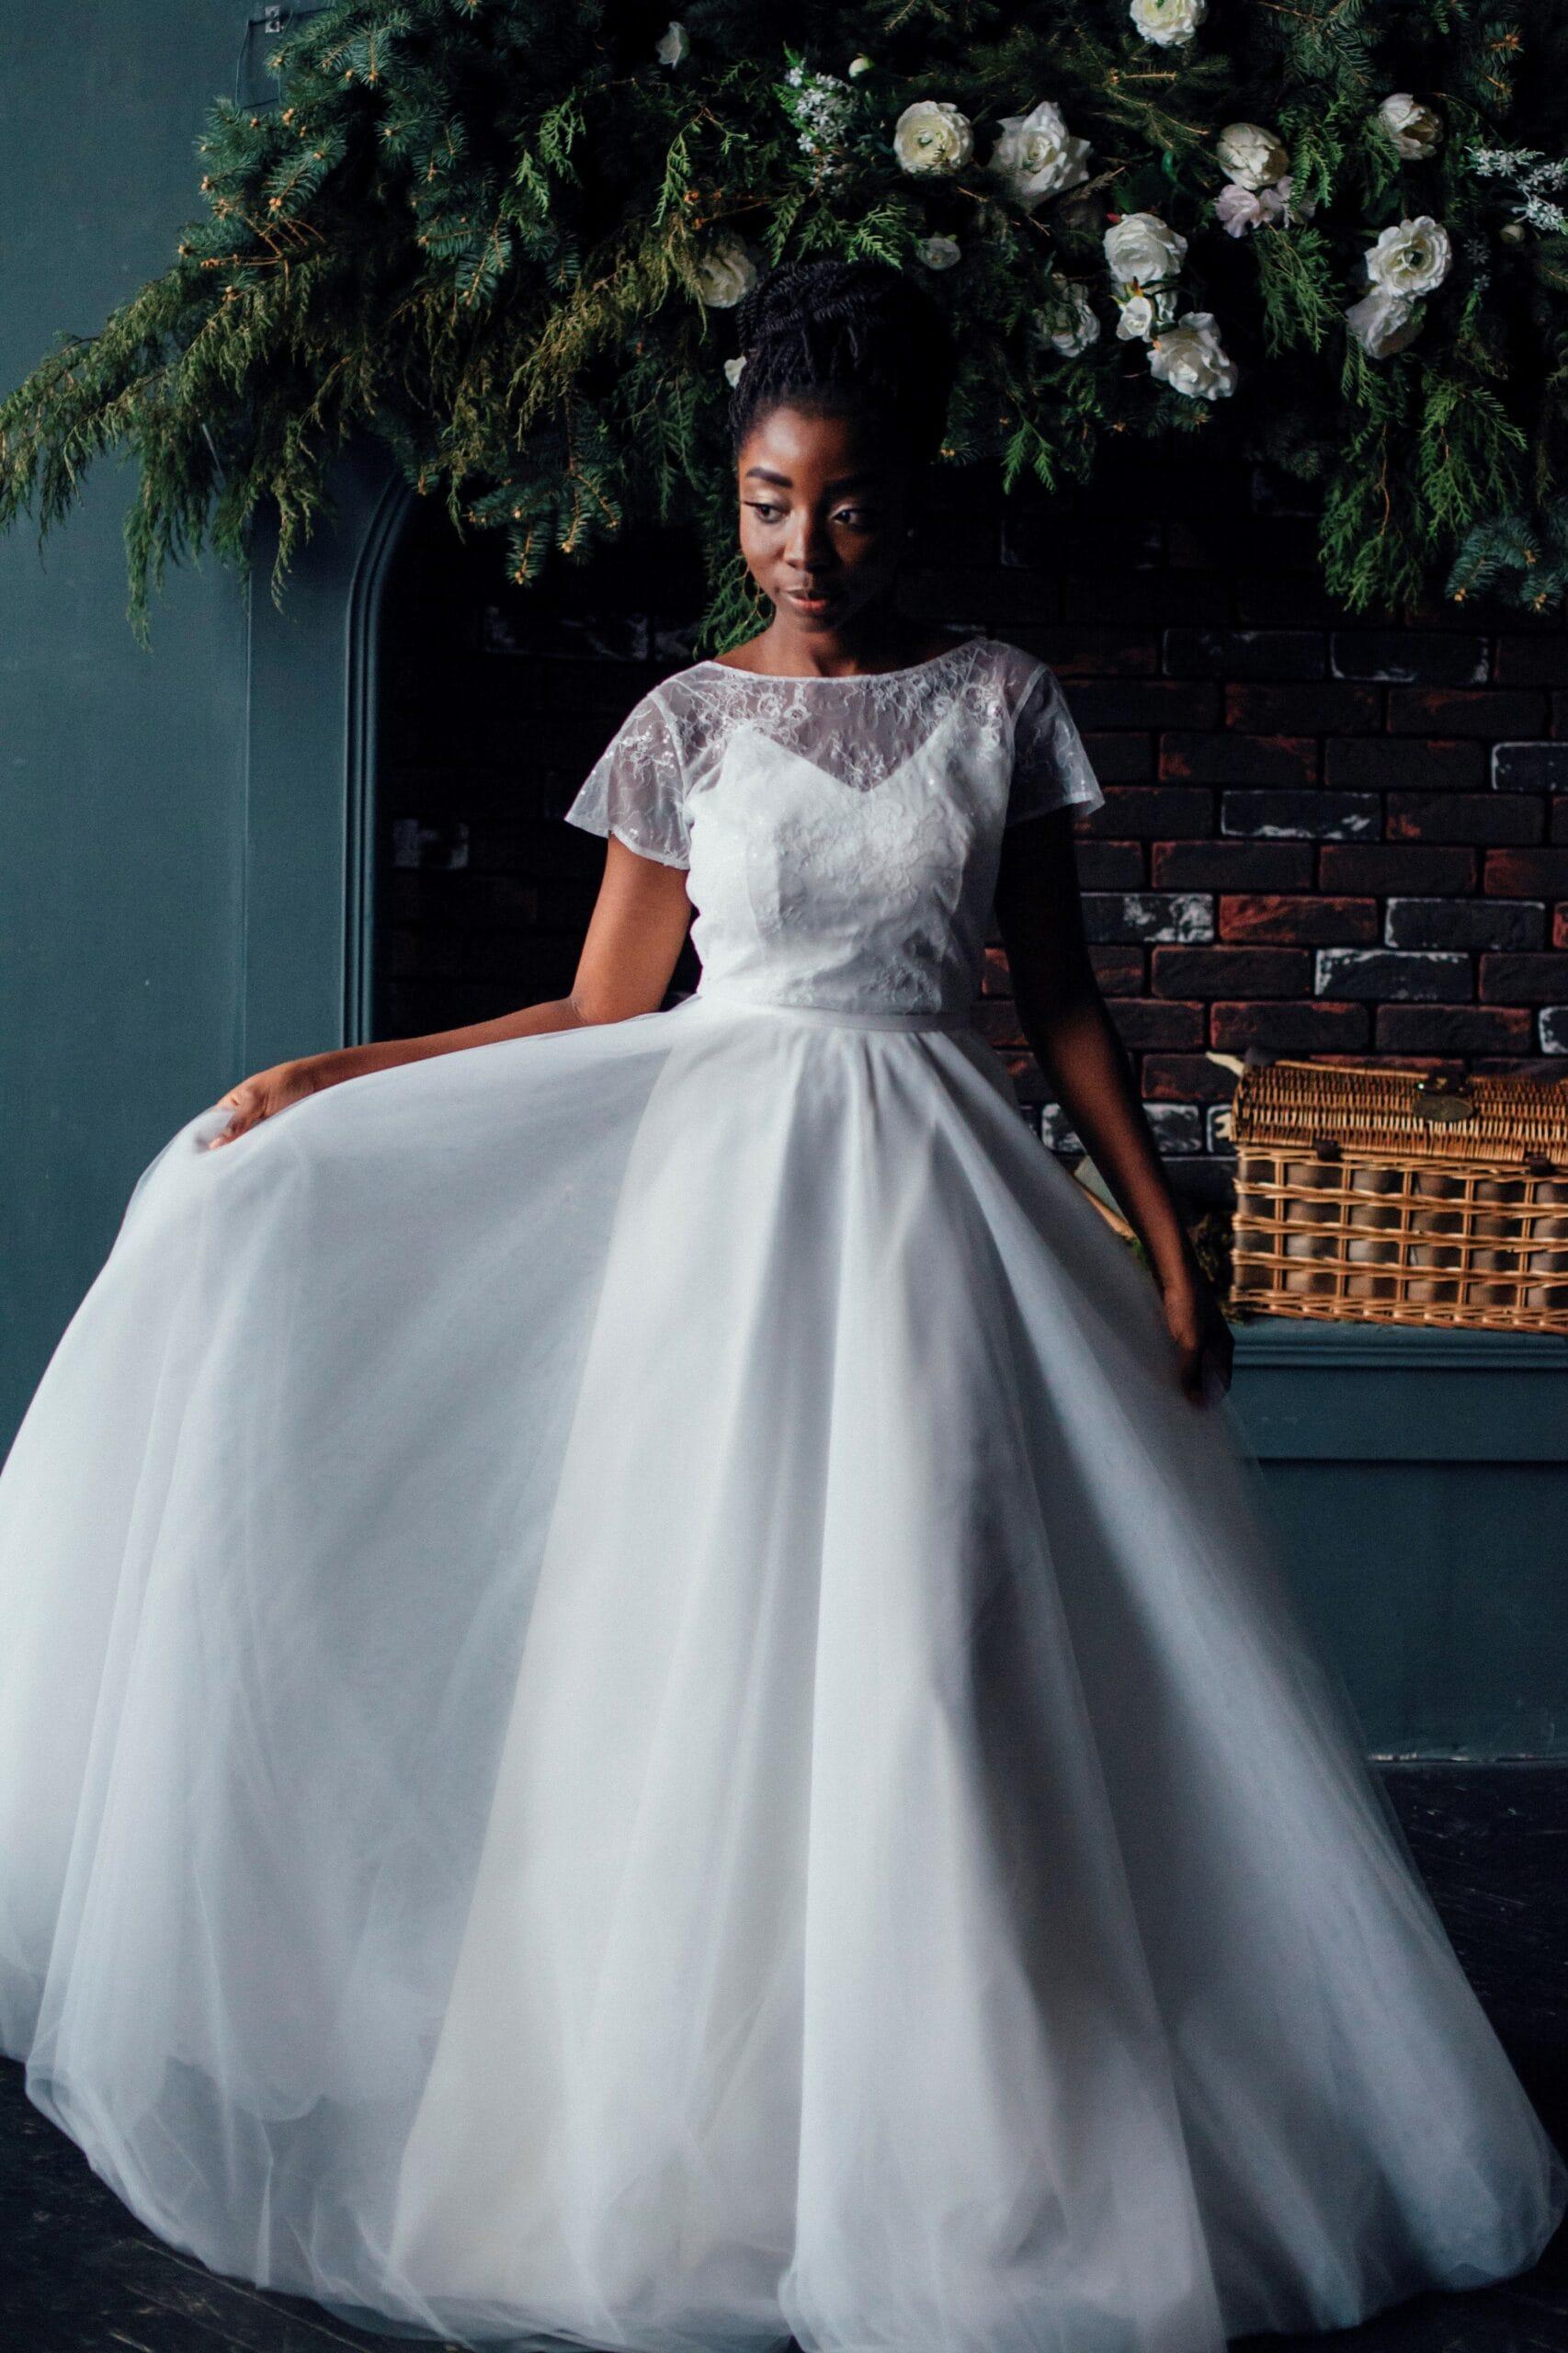 Свадебное платье MELANIE, коллекция THE ABSOLUTE LOVE, бренд RARE BRIDAL, фото 2